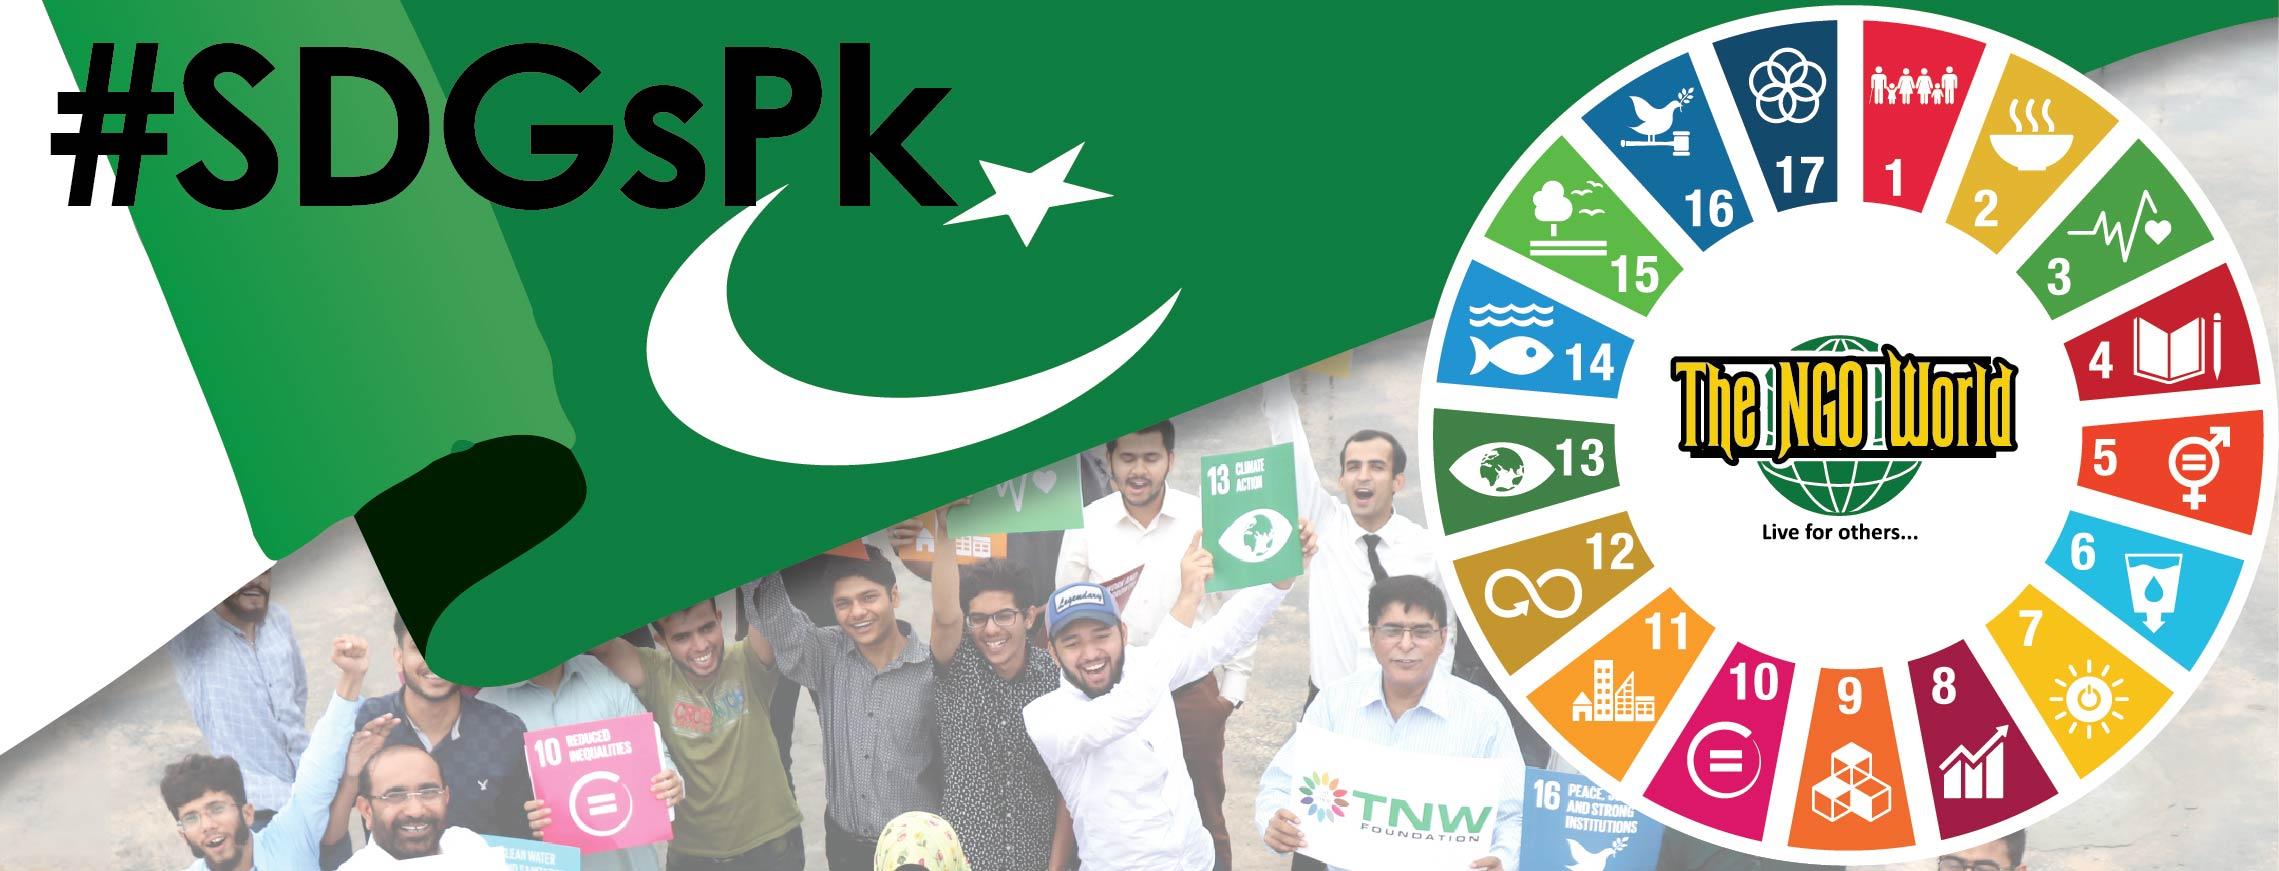 SDG.pk banners-04